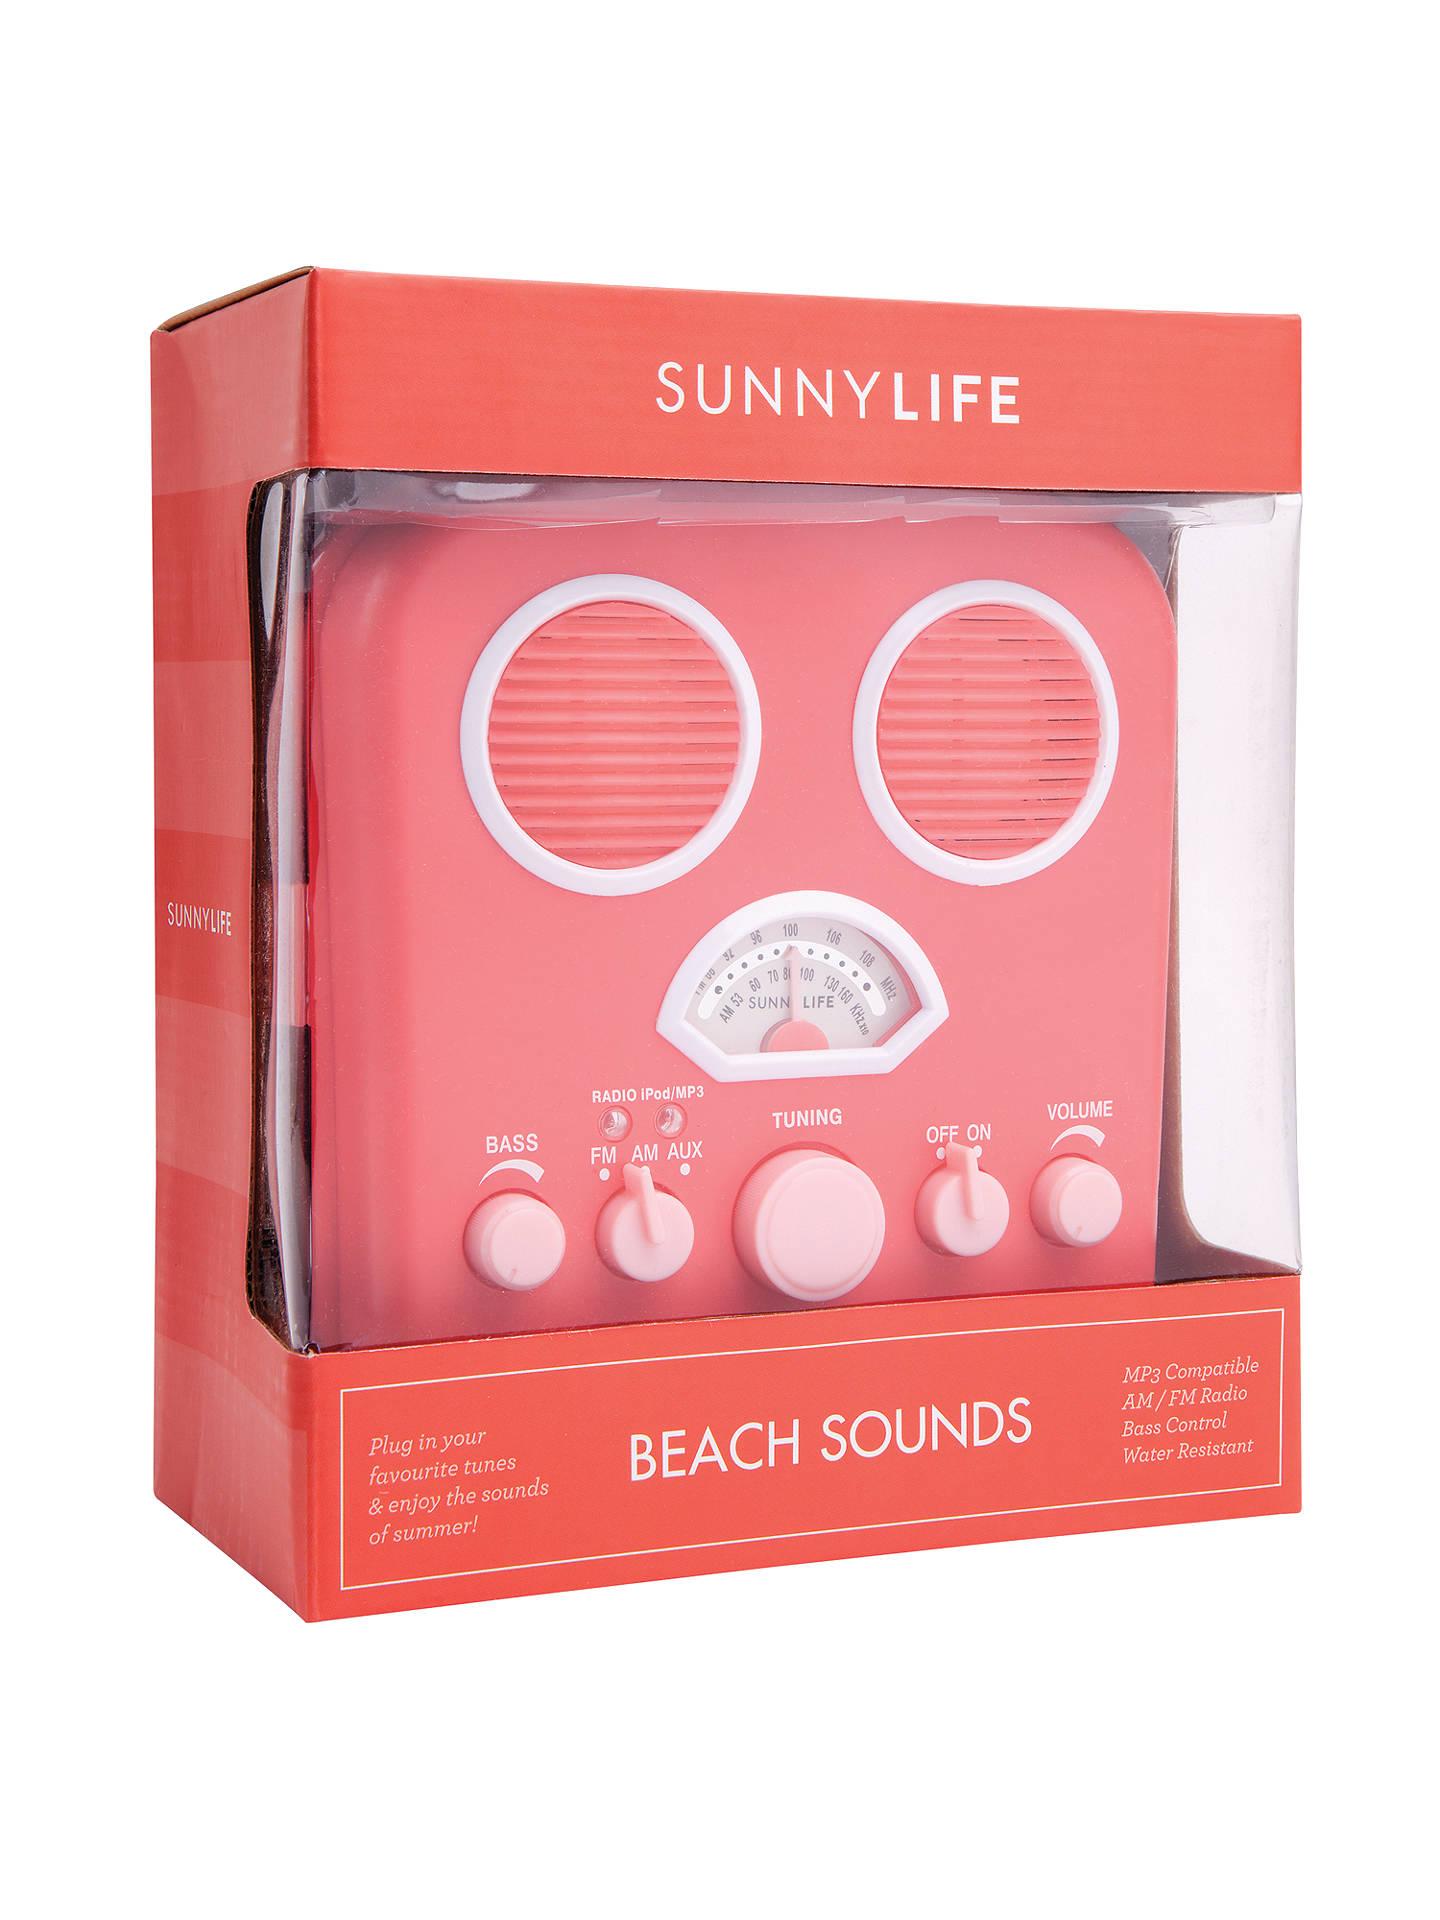 Sunnylife Beach Sounds Radio C At John Lewis Partners